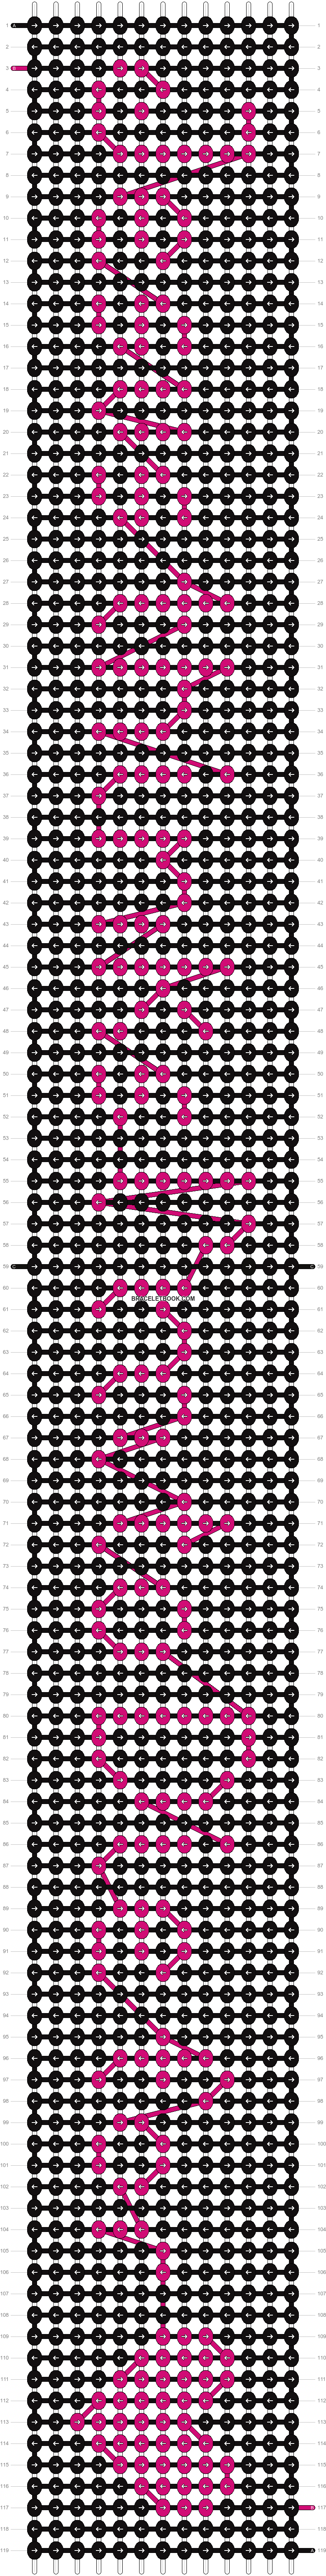 Alpha pattern #7381 pattern